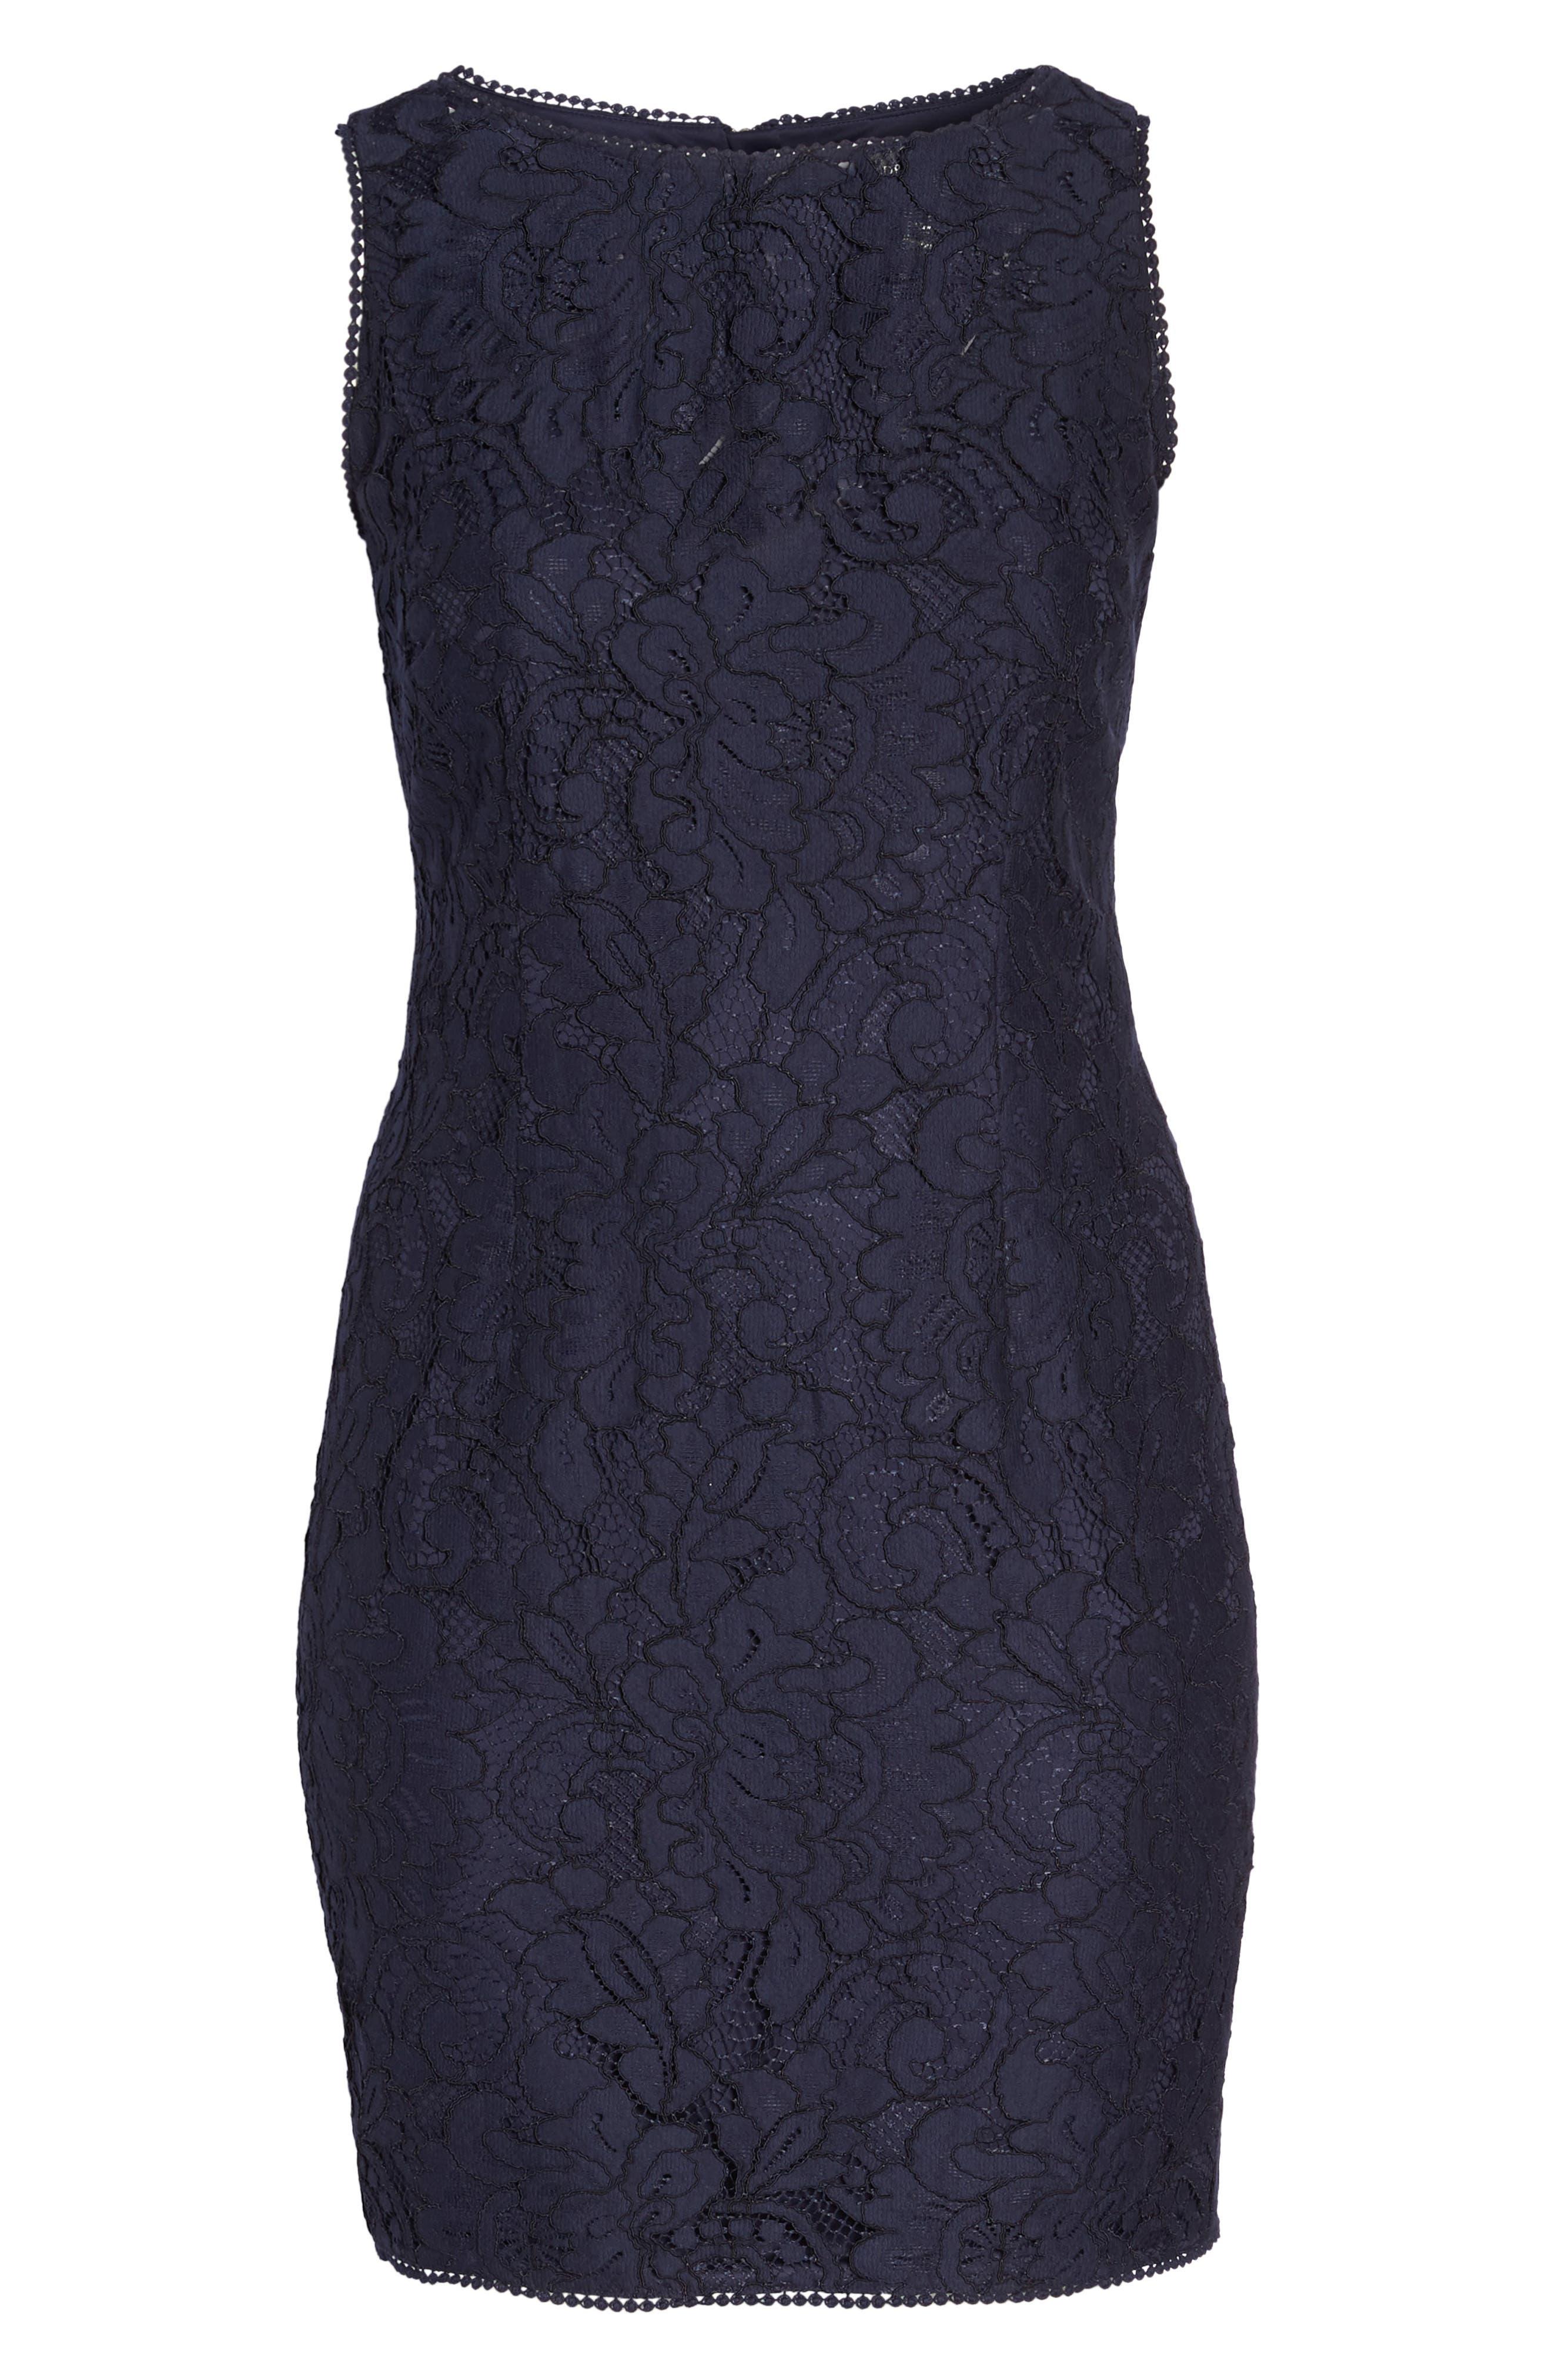 Lace Sheath Dress,                             Alternate thumbnail 7, color,                             Navy